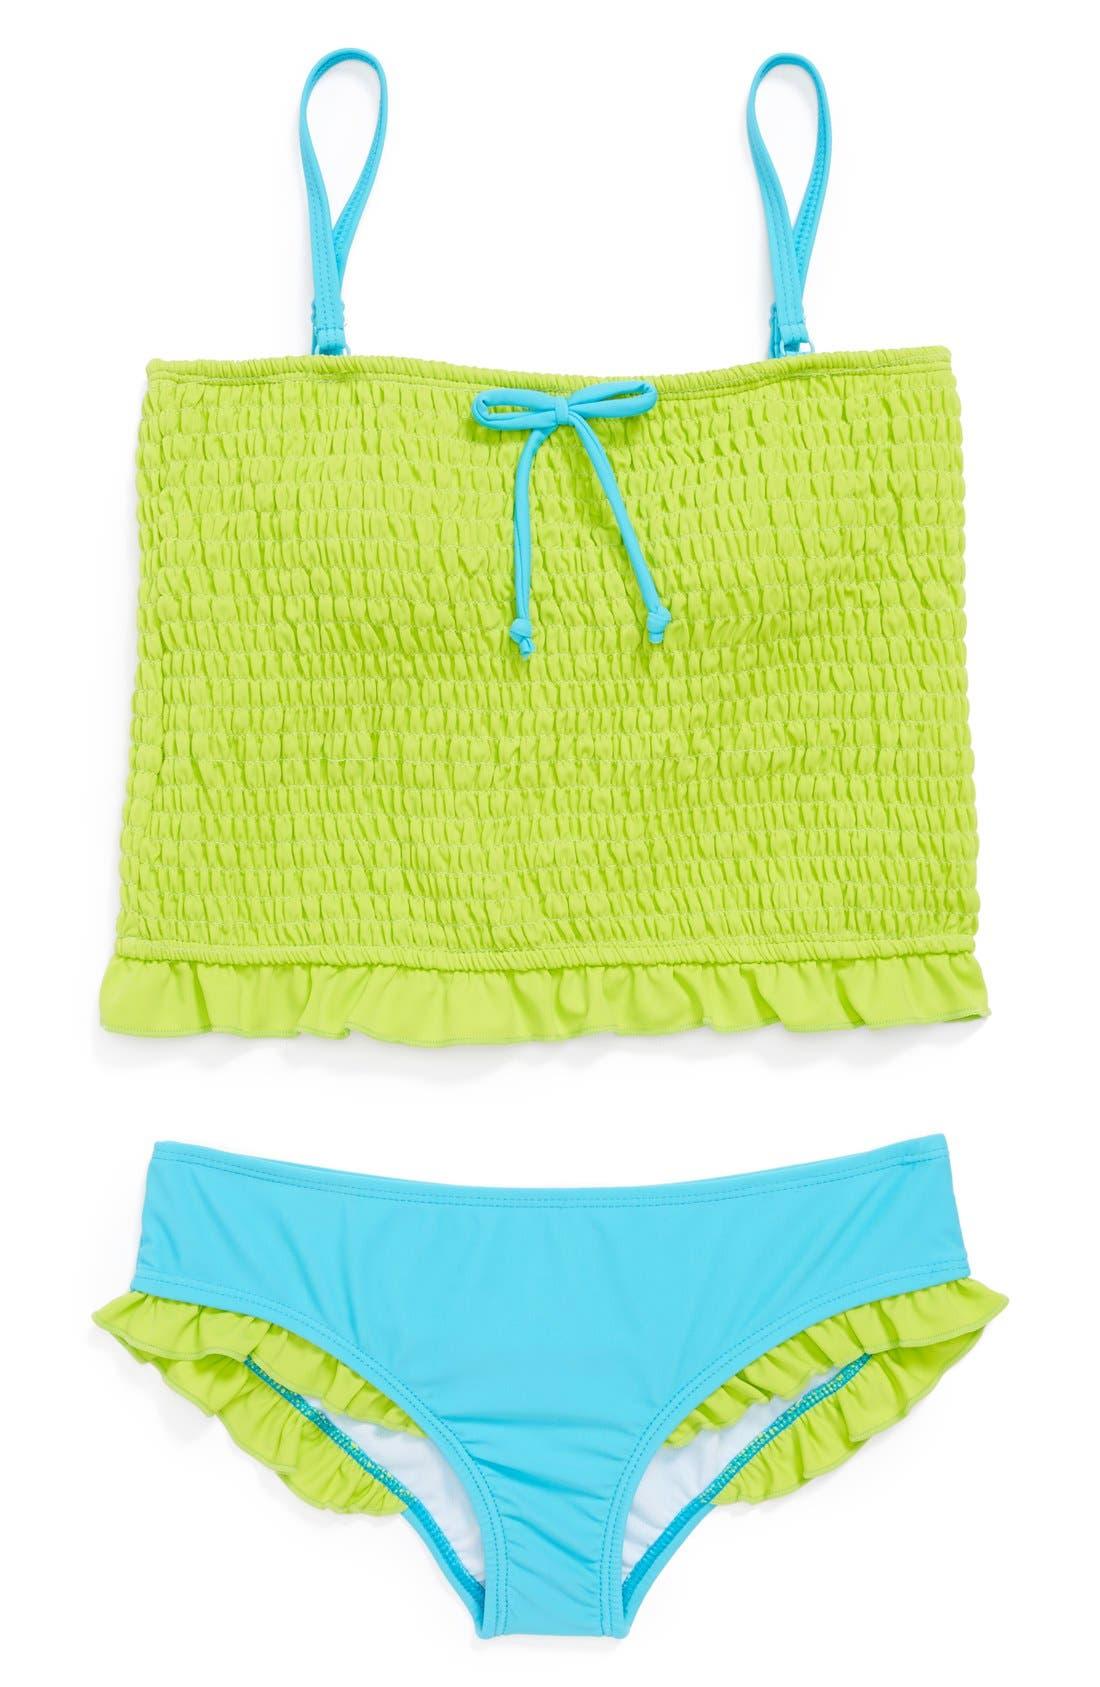 Main Image - Limeapple 'Splash' Two-Piece Tankini Swimsuit (Big Girls)